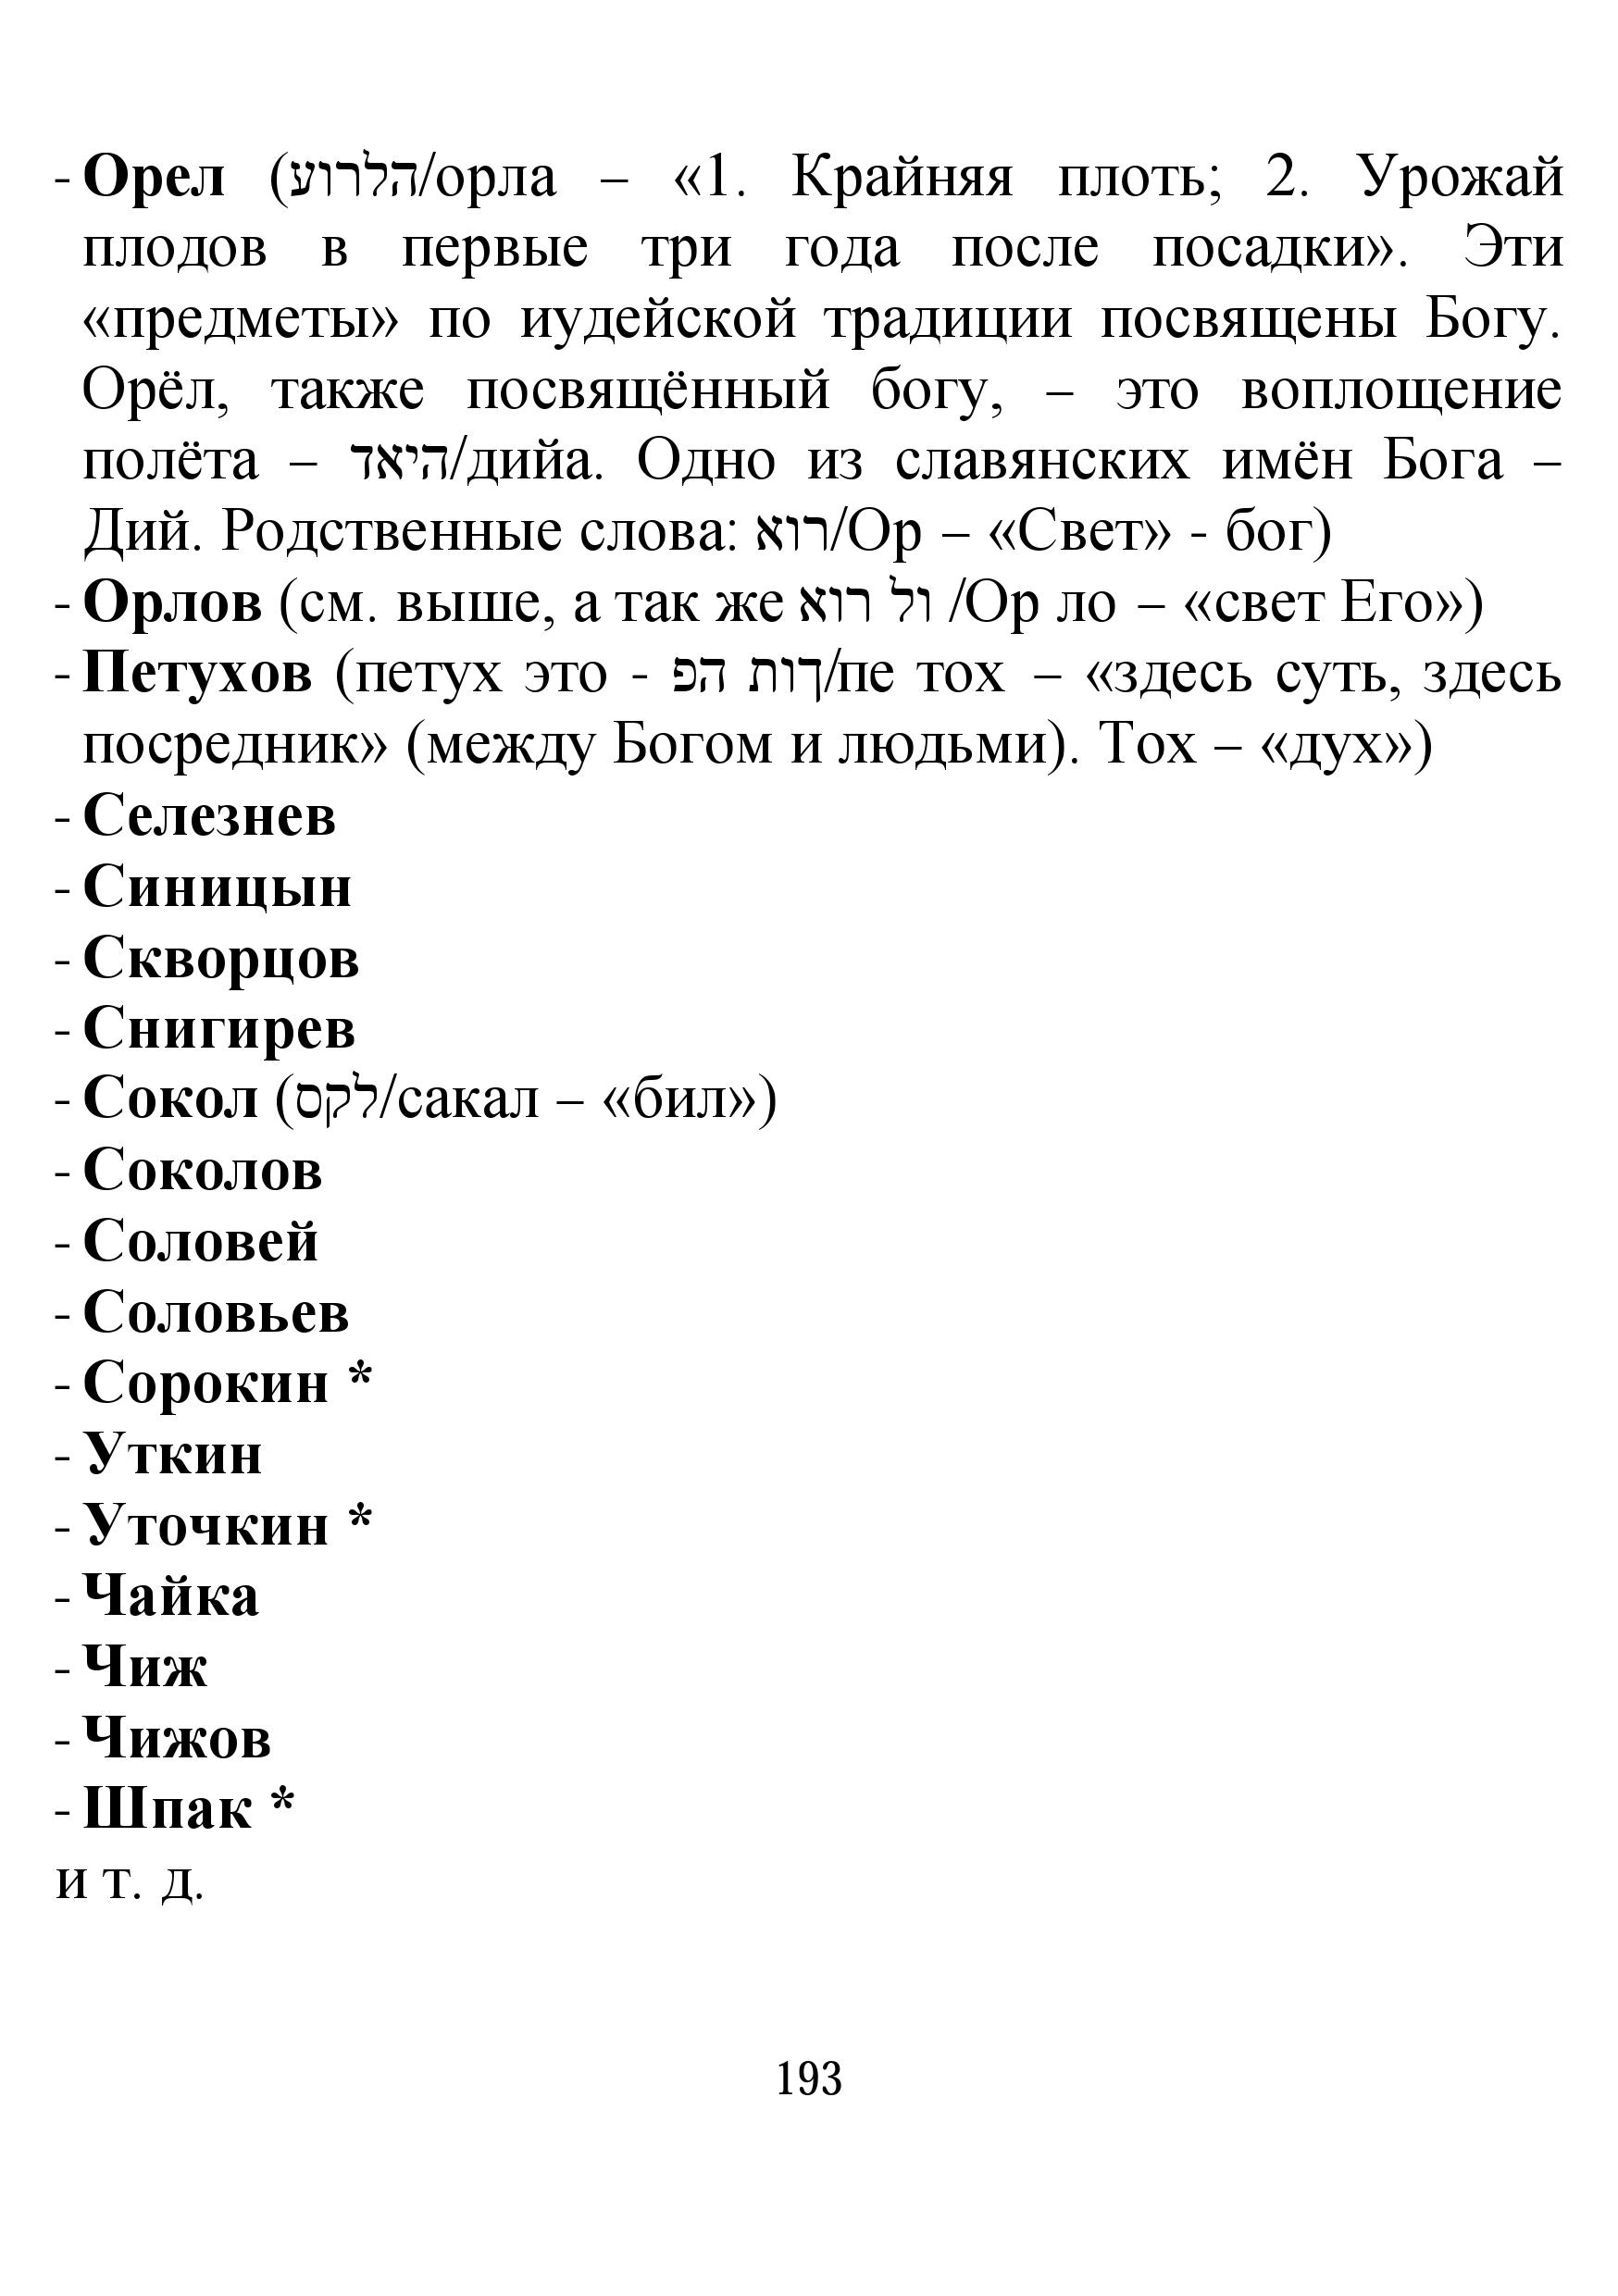 http://s6.uploads.ru/IVdx6.jpg